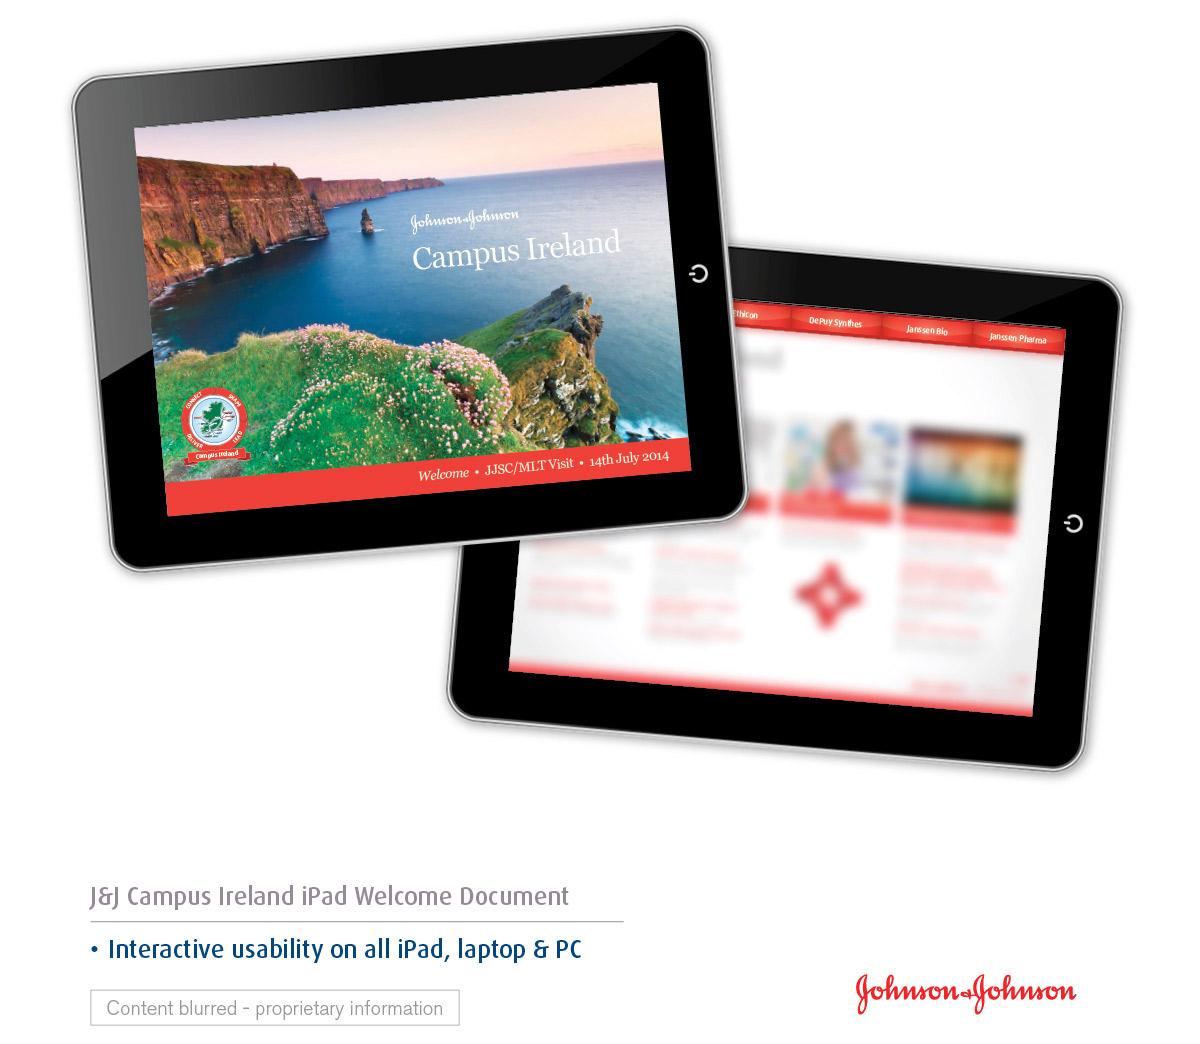 JJ_CampusIreland_InteractiveiPad.jpg